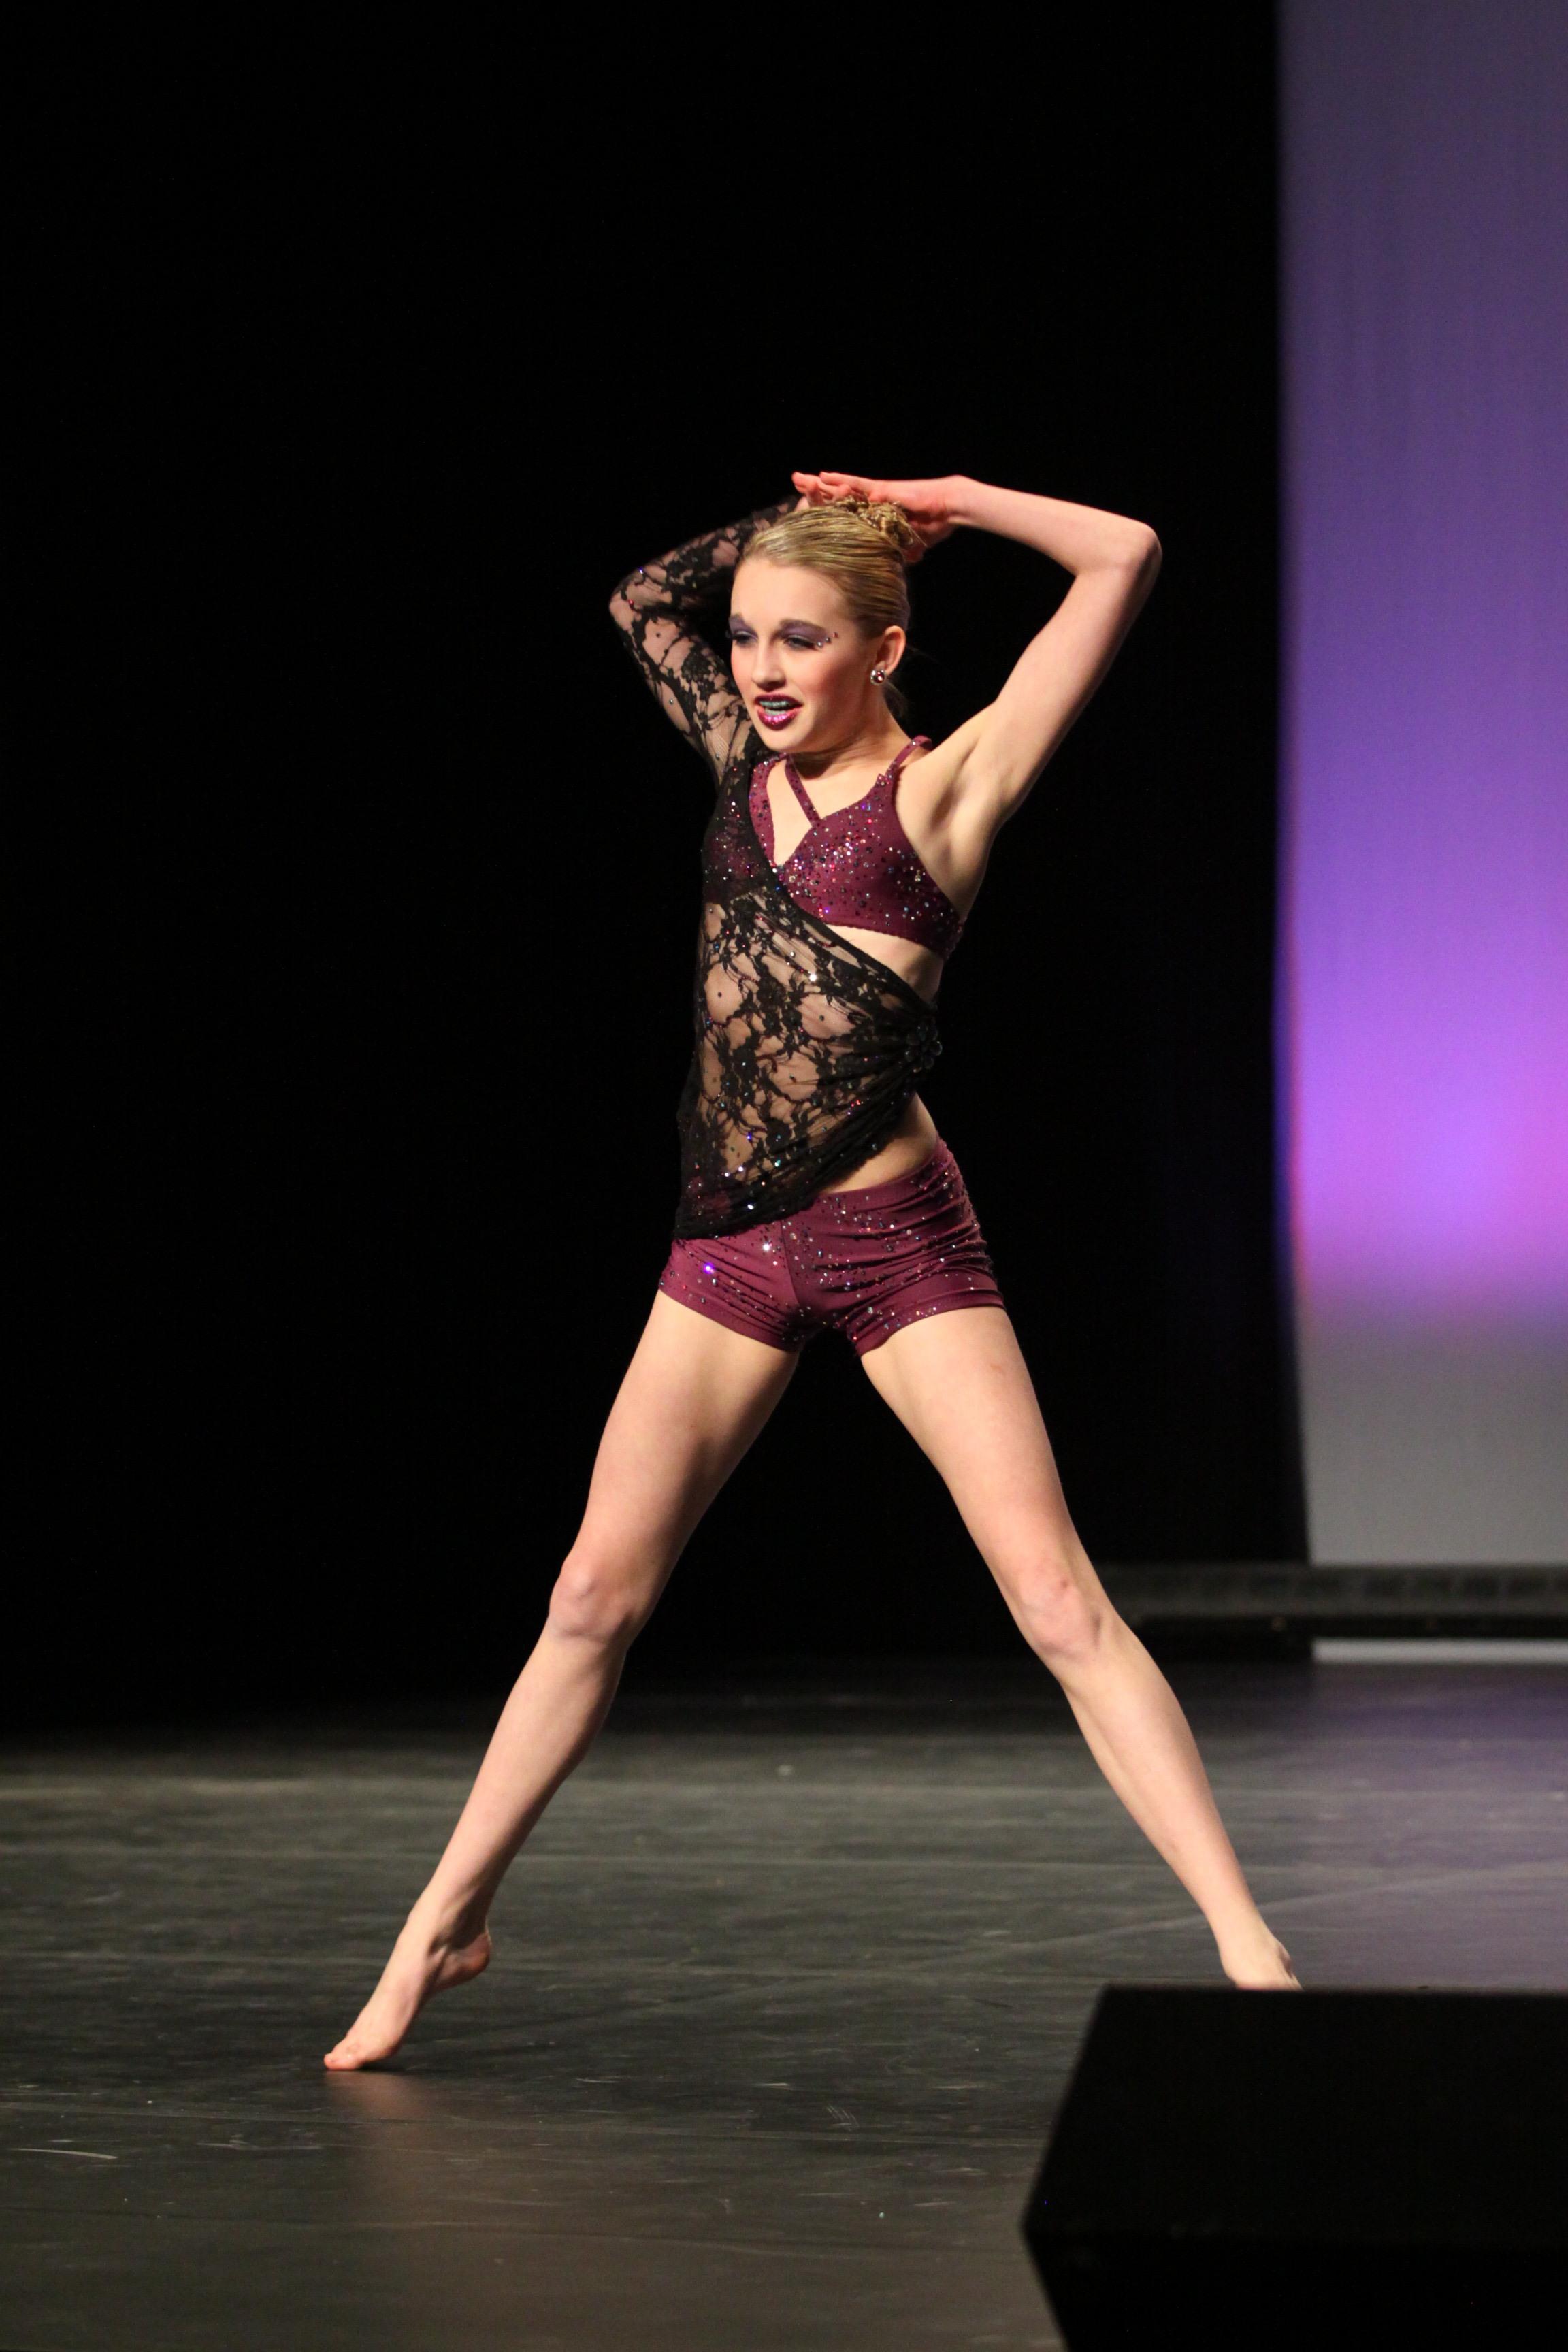 2011 - Haley Foucault from Northland School of Dance